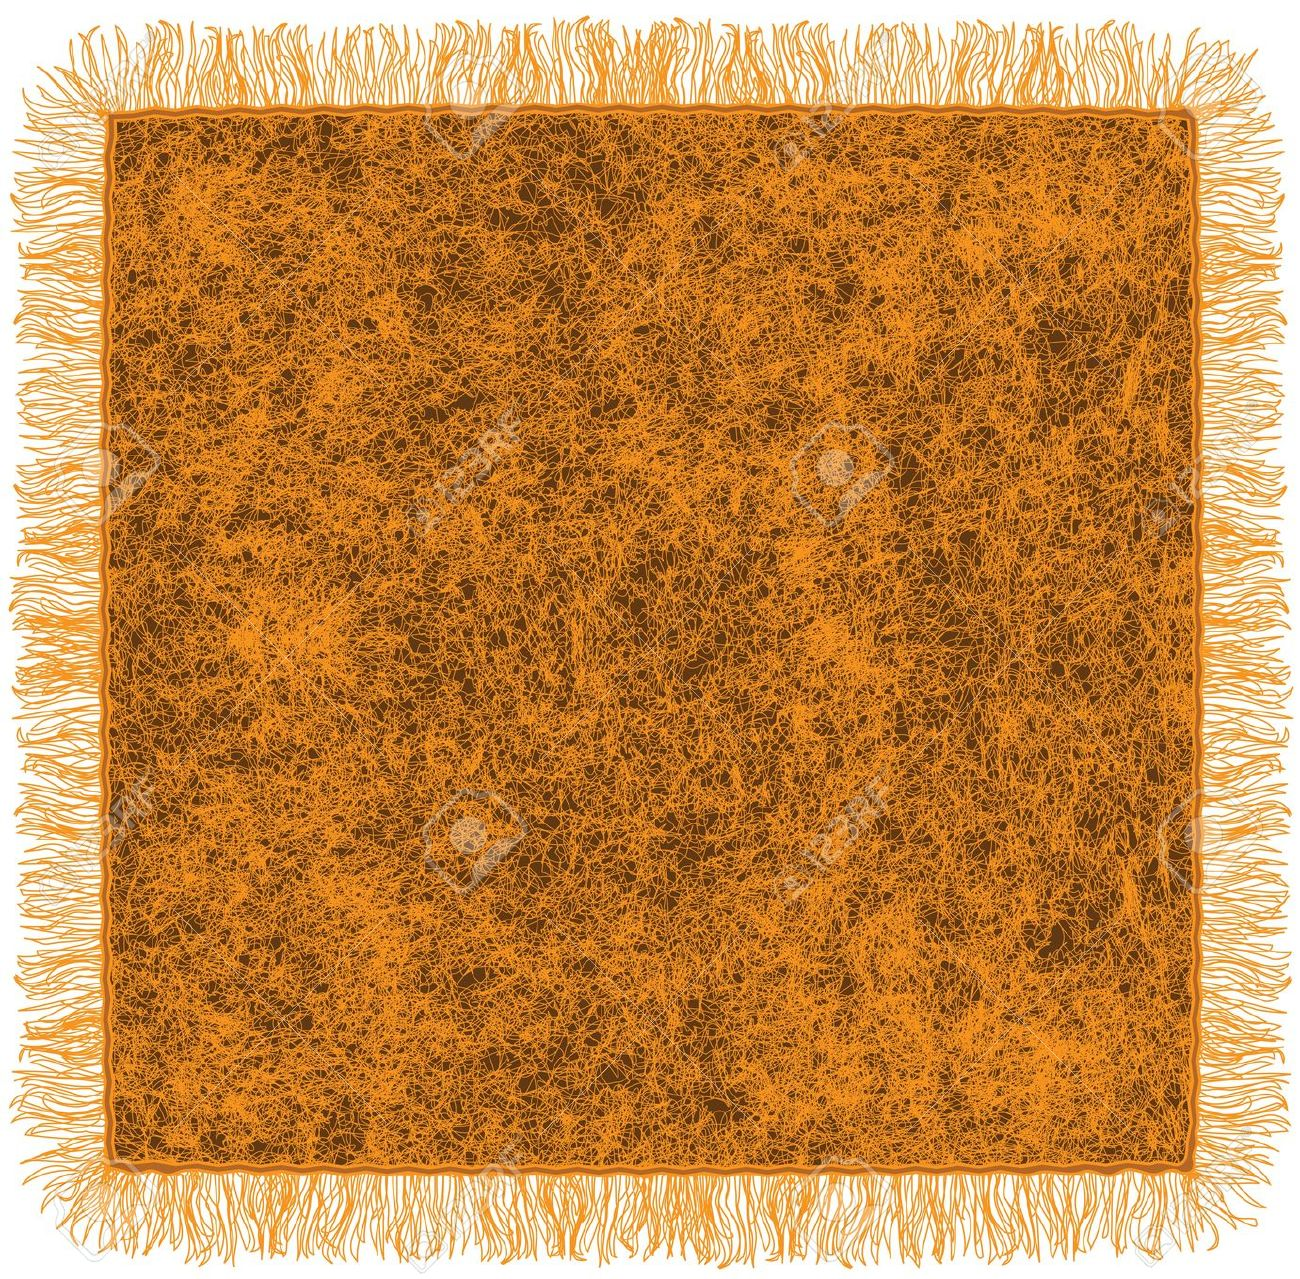 Woollen Blanket With Fringe In Orange And Brown Colors Royalty.